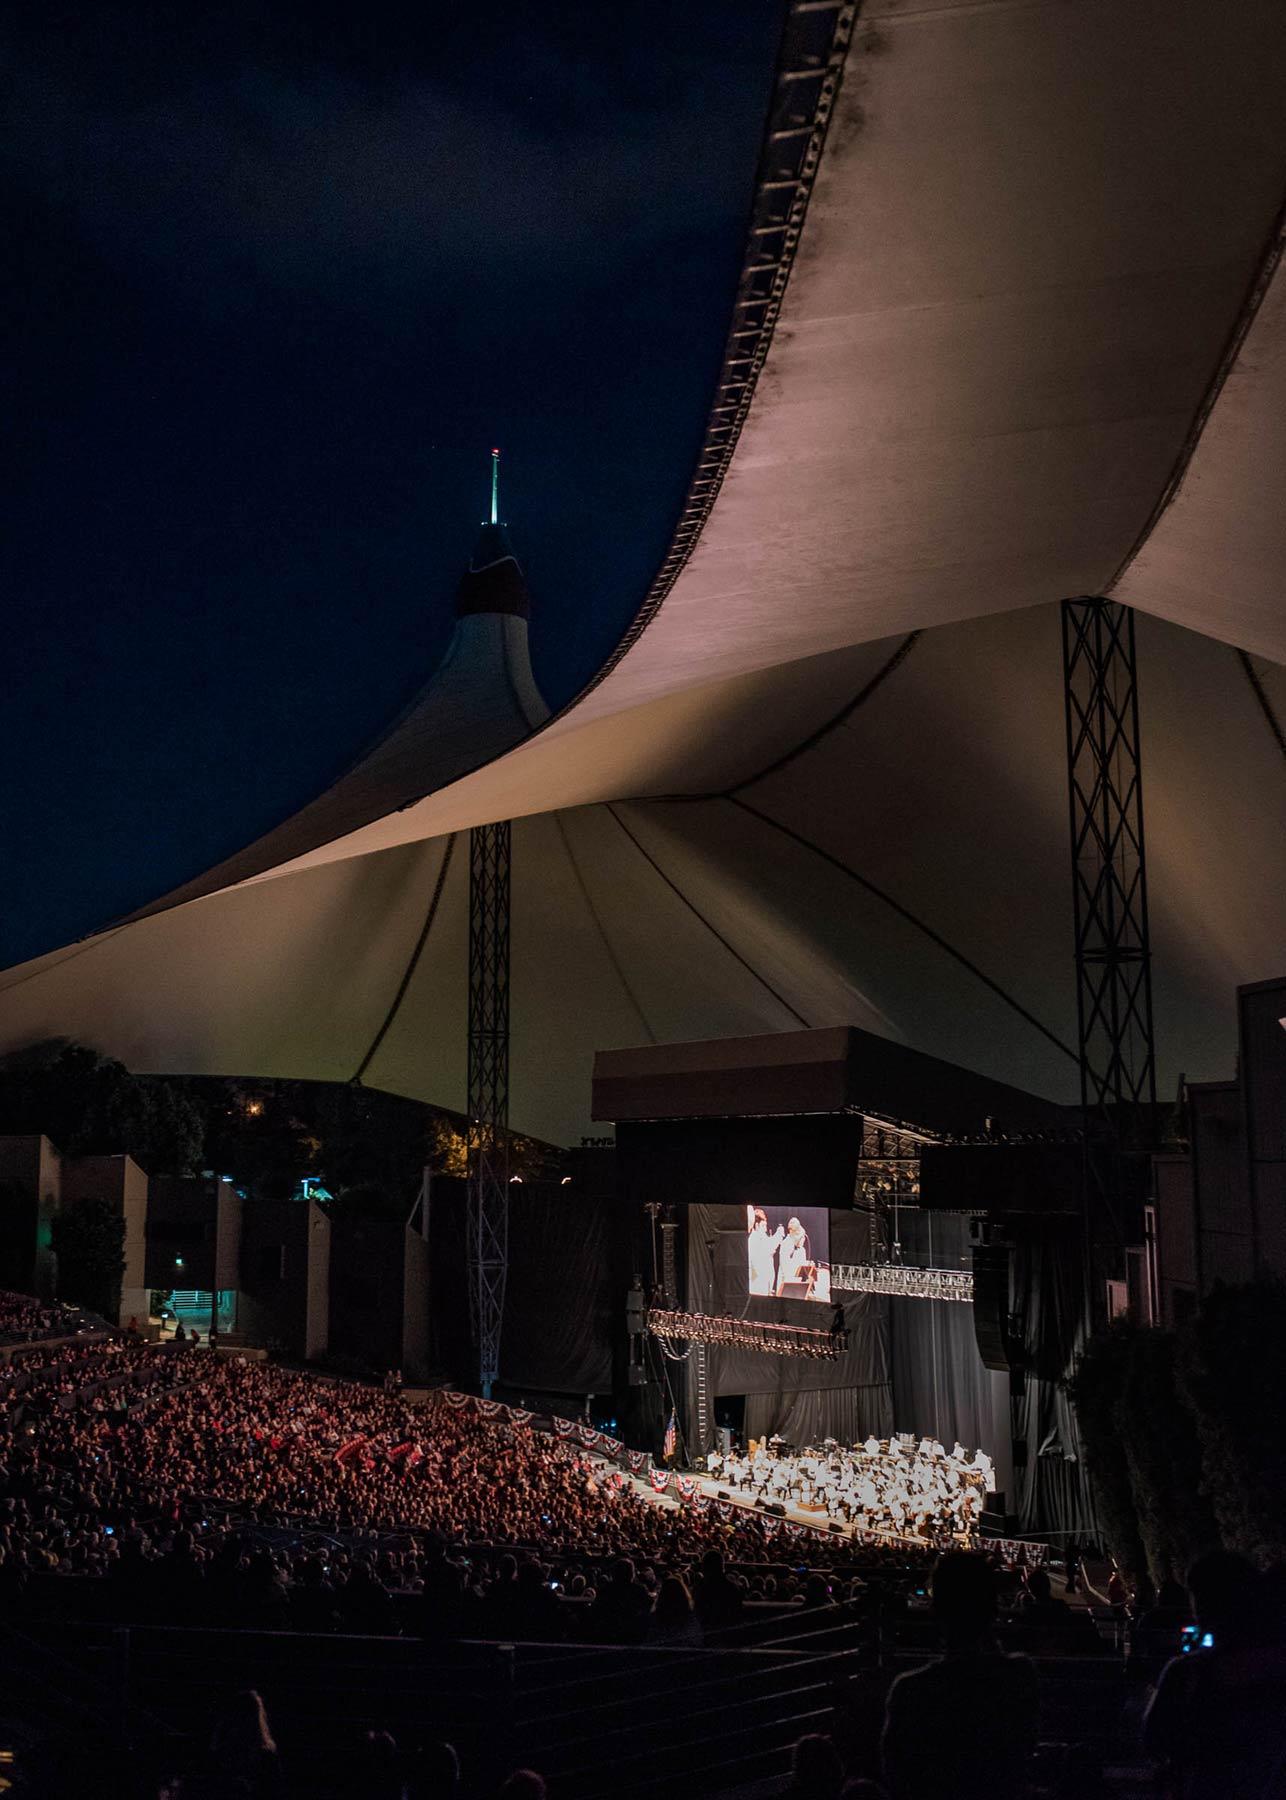 san_francisco_symphony_orchestra_concert_shoreline_amphitheatre_brandon_patoc_0001.jpg